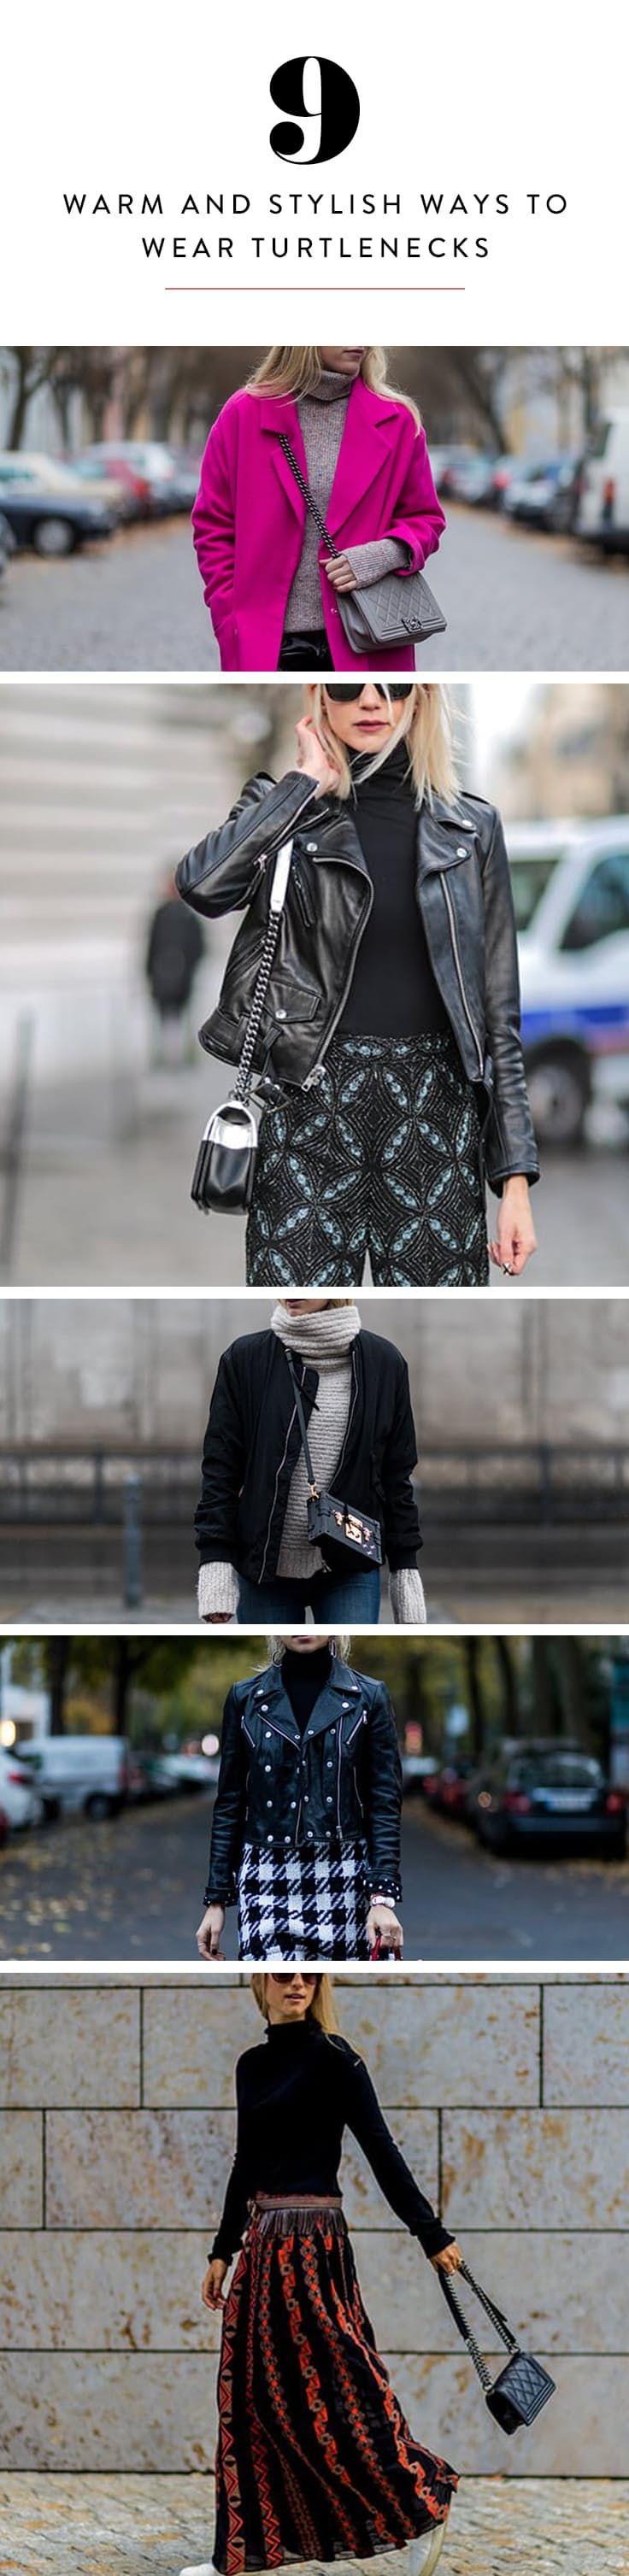 9 Warm and Stylish Ways to Wear Turtlenecks This Winter via @PureWow